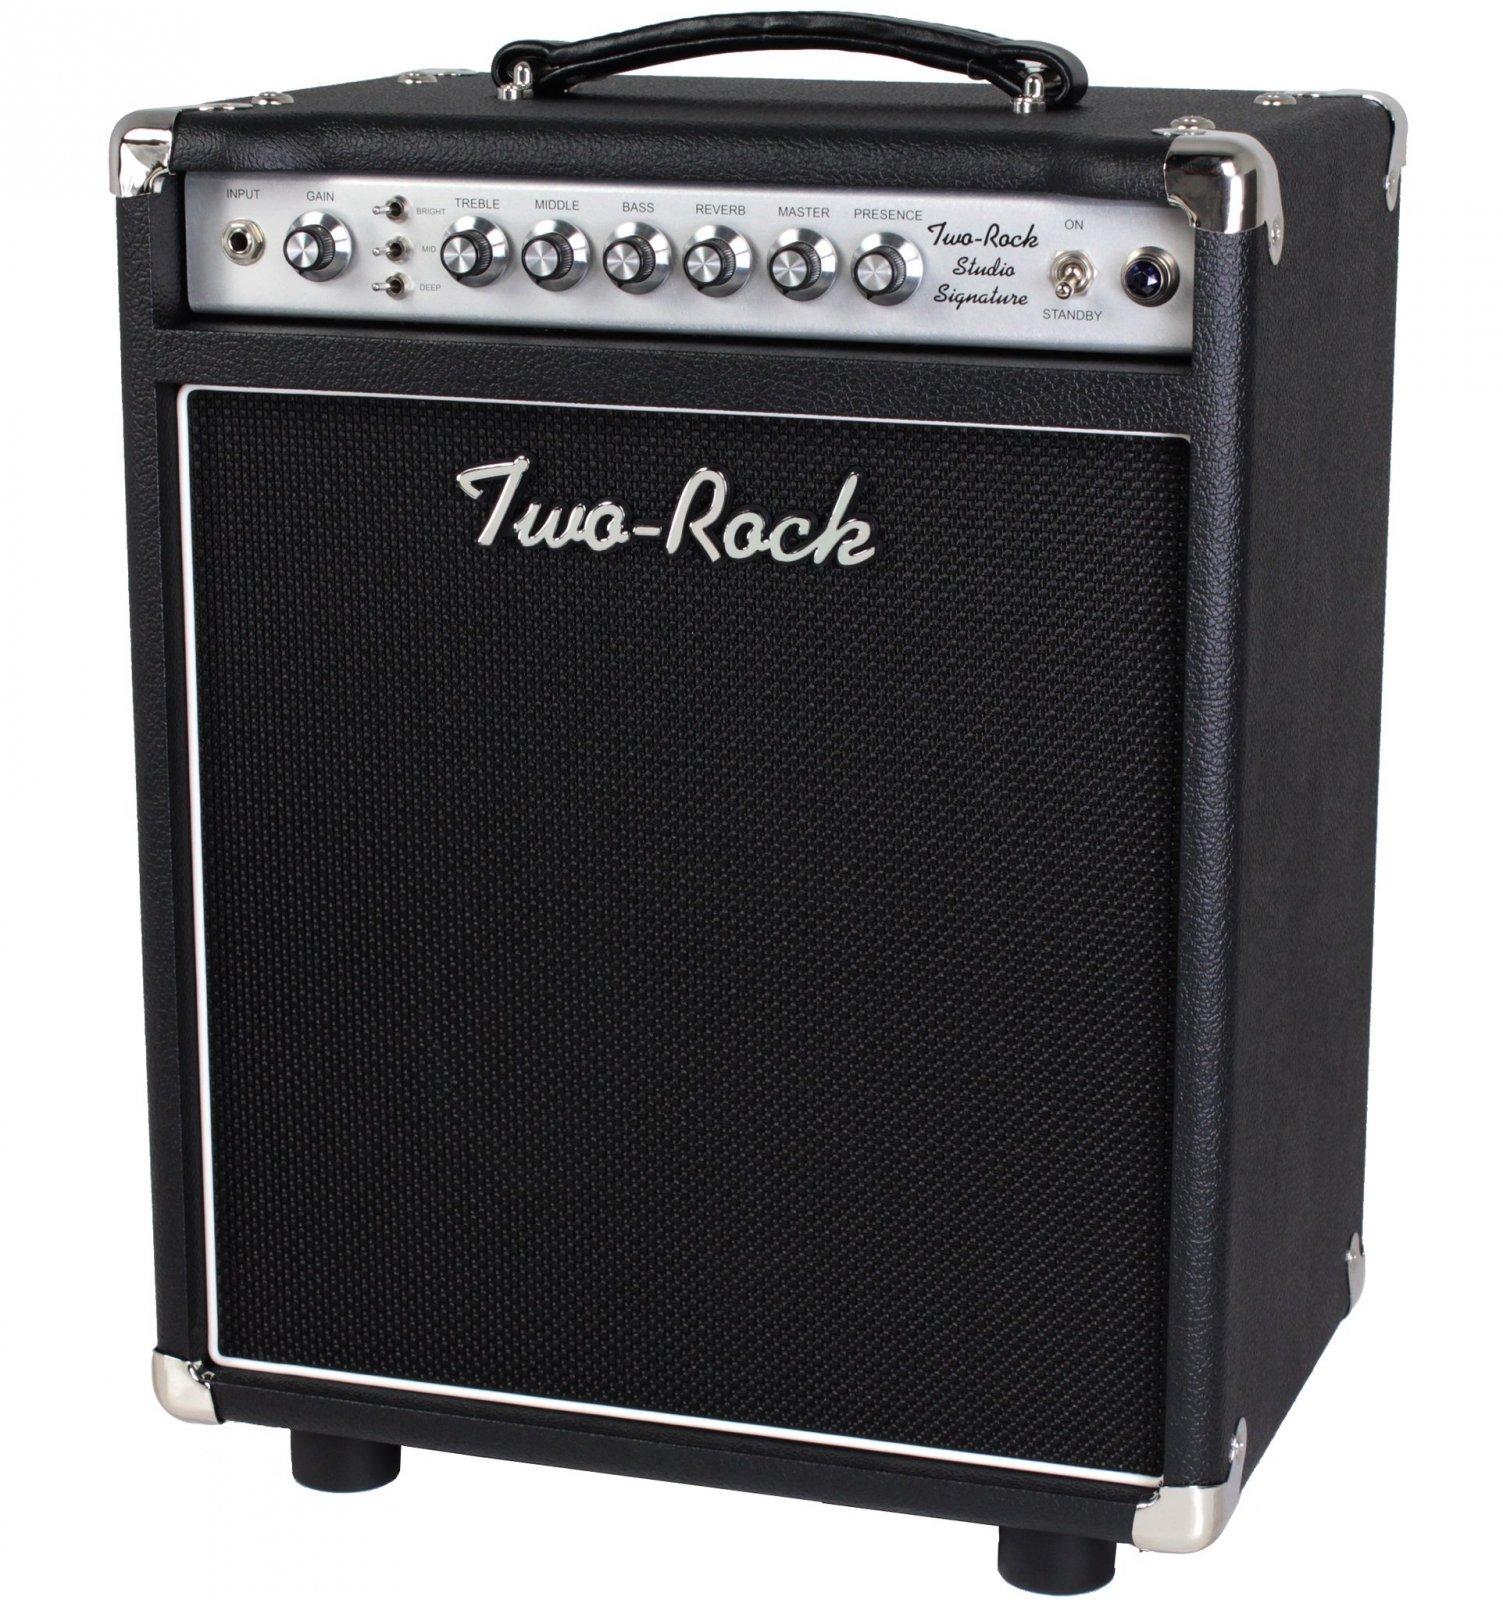 Two-Rock Studio Signature Combo (Coming Soon)